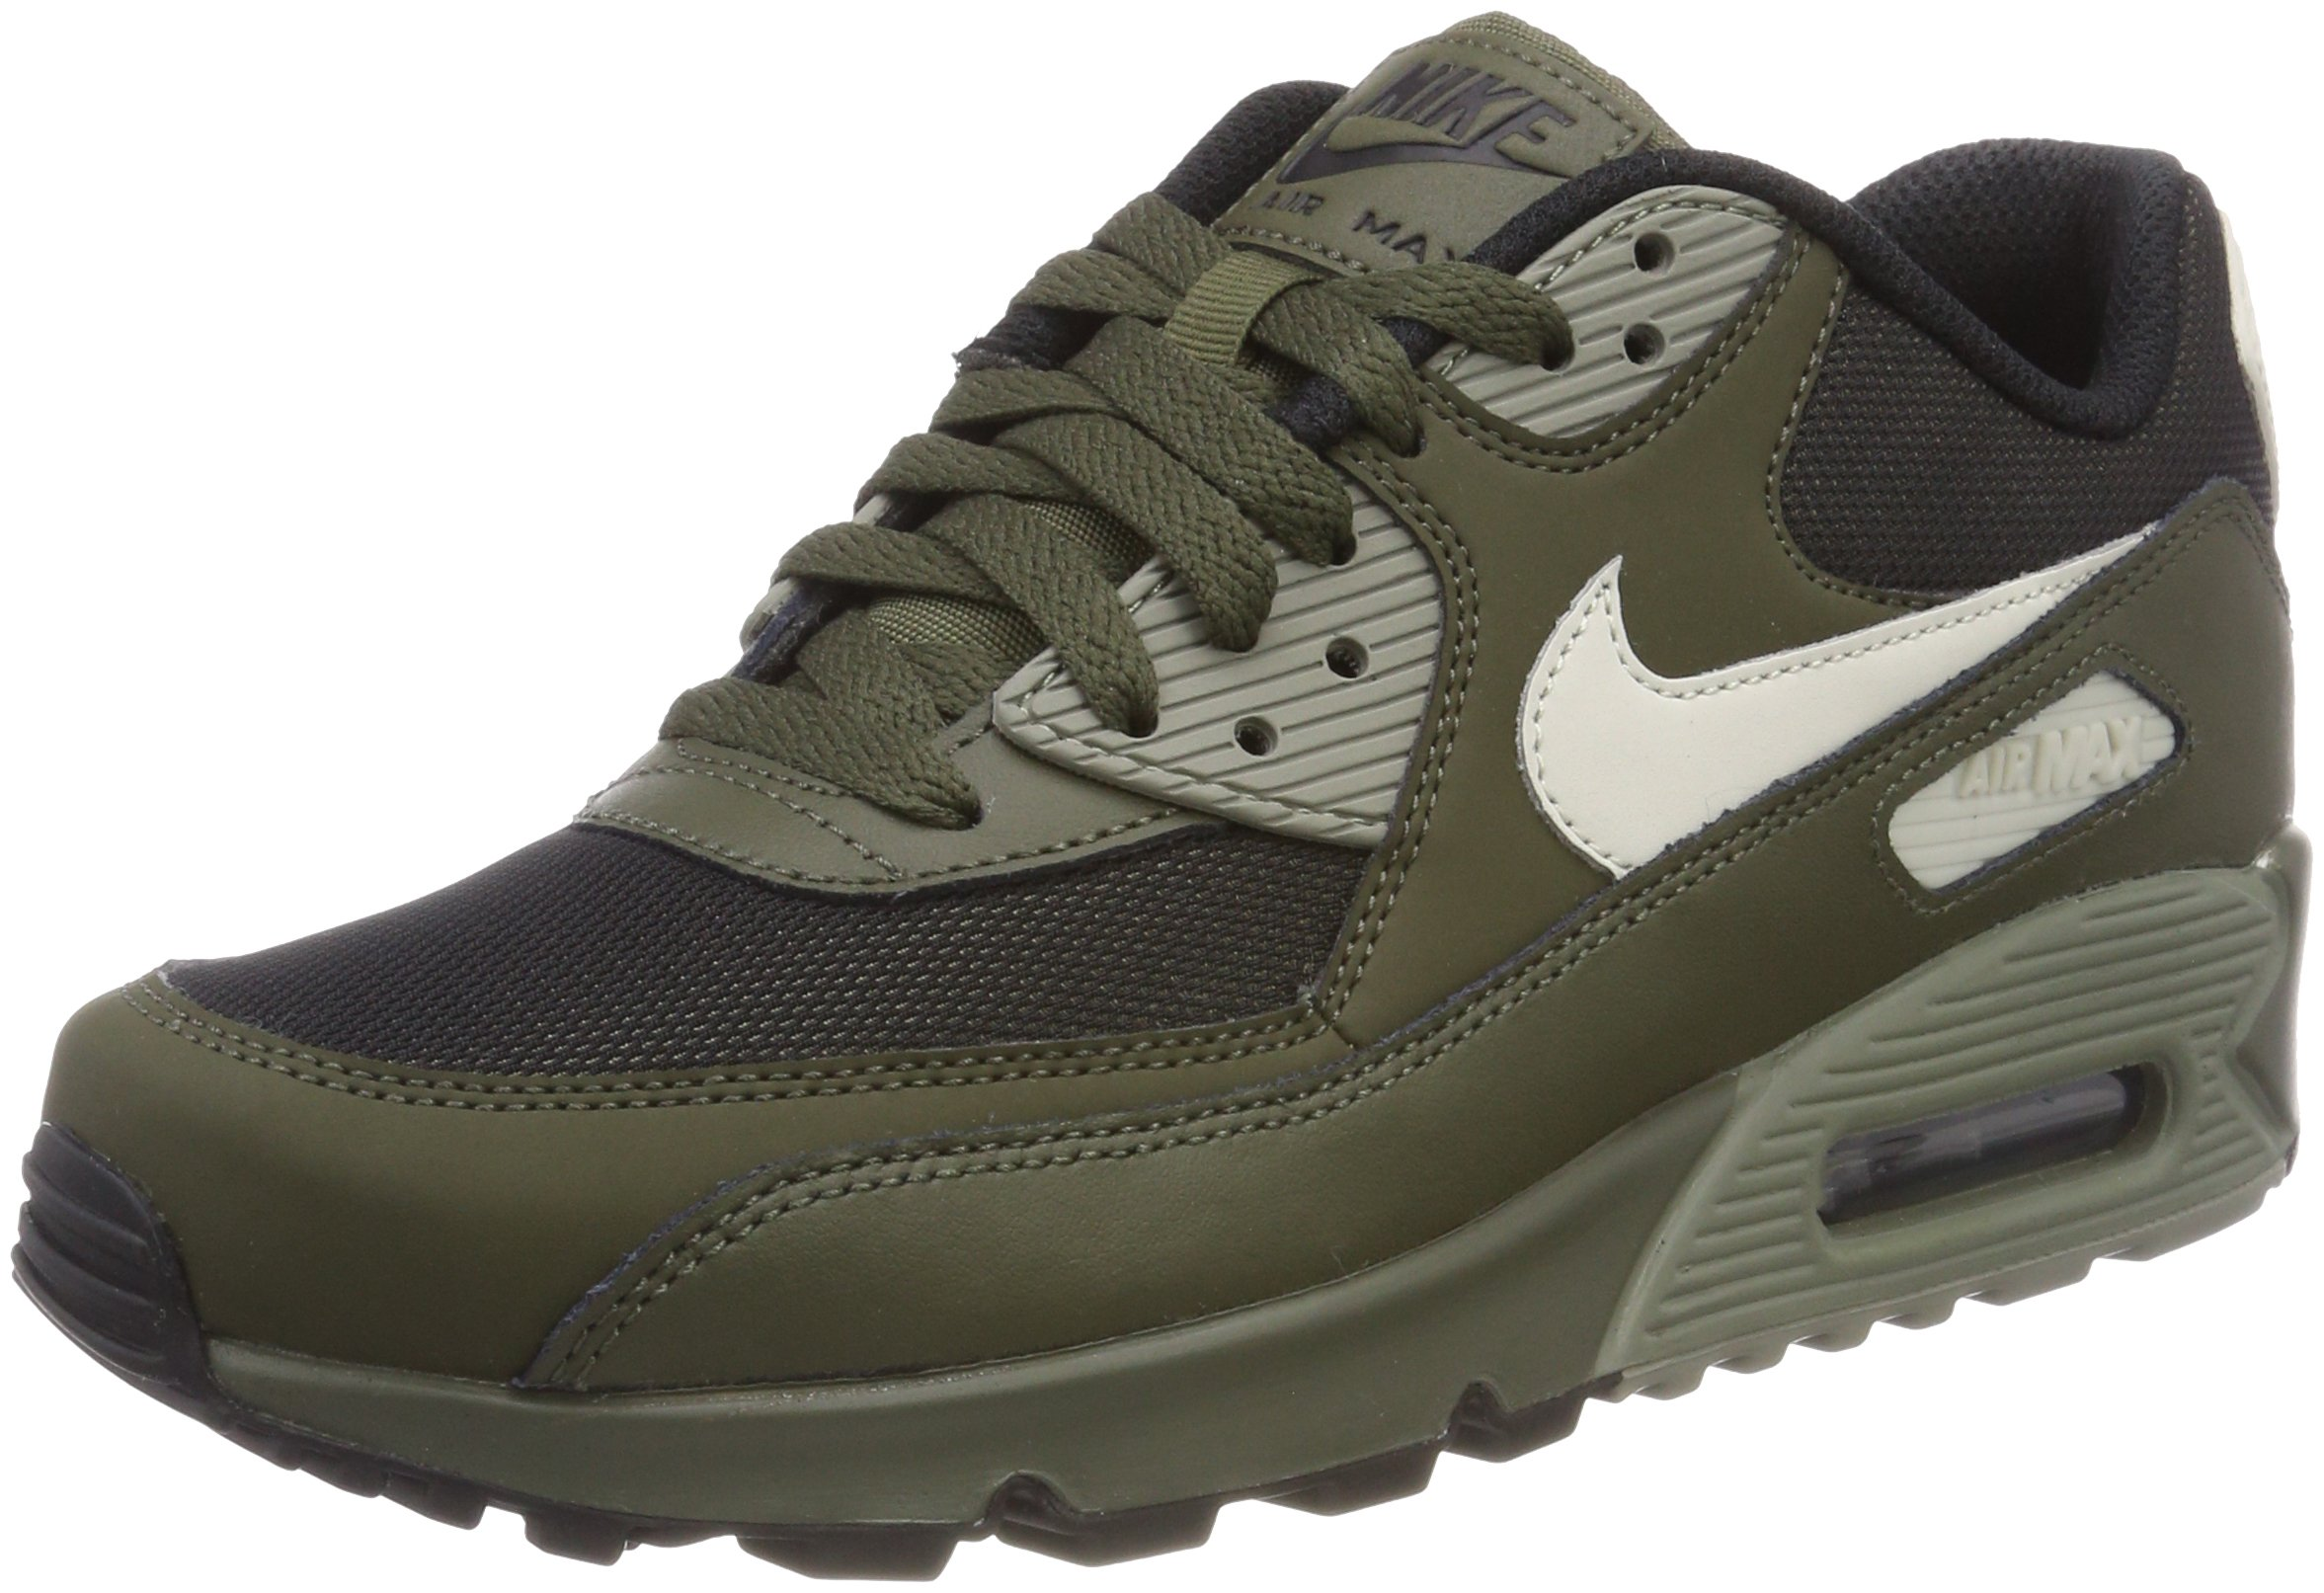 watch 6456f 36f3a Galleon - Nike Men''s Air Max 90 Essential Low-Top Sneakers, Green (Cargo  Khaki/Light Bone-Dark Stucco-Black 309), 6 UK